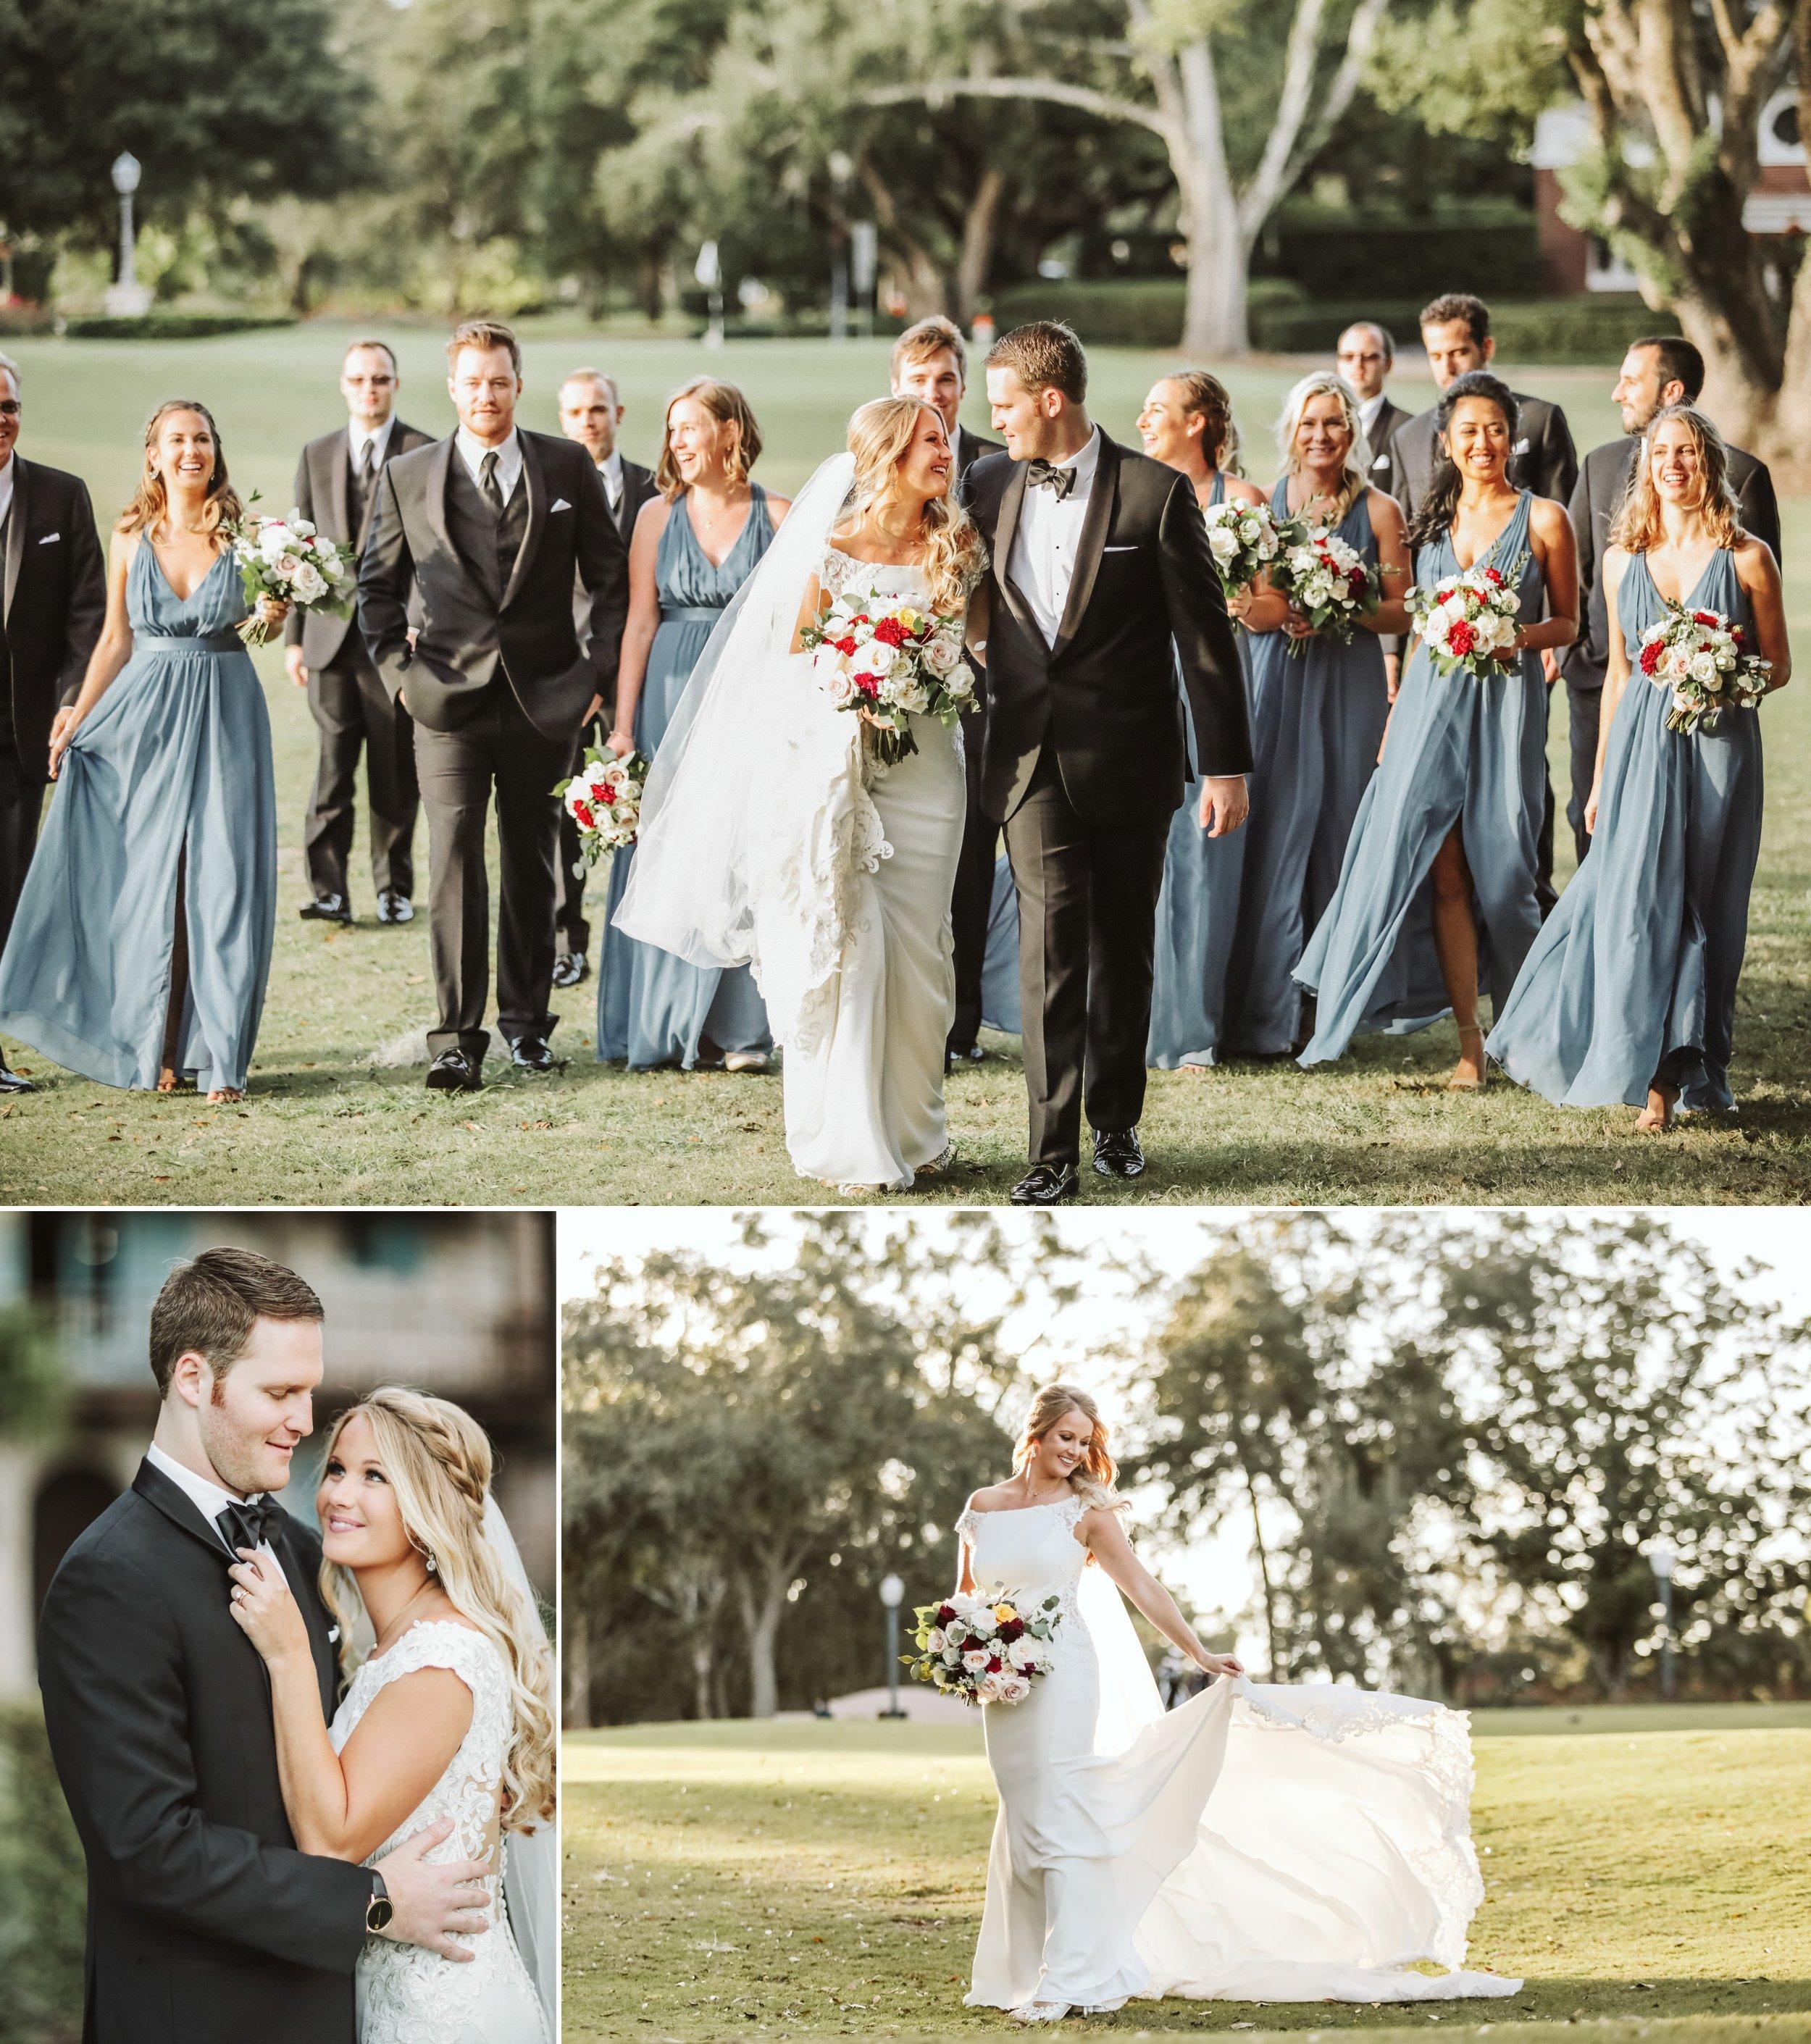 Casa Feliz Romantic Black Tie Wedding- Nick + Marissa- by Shaina DeCiryan Photography6.jpg